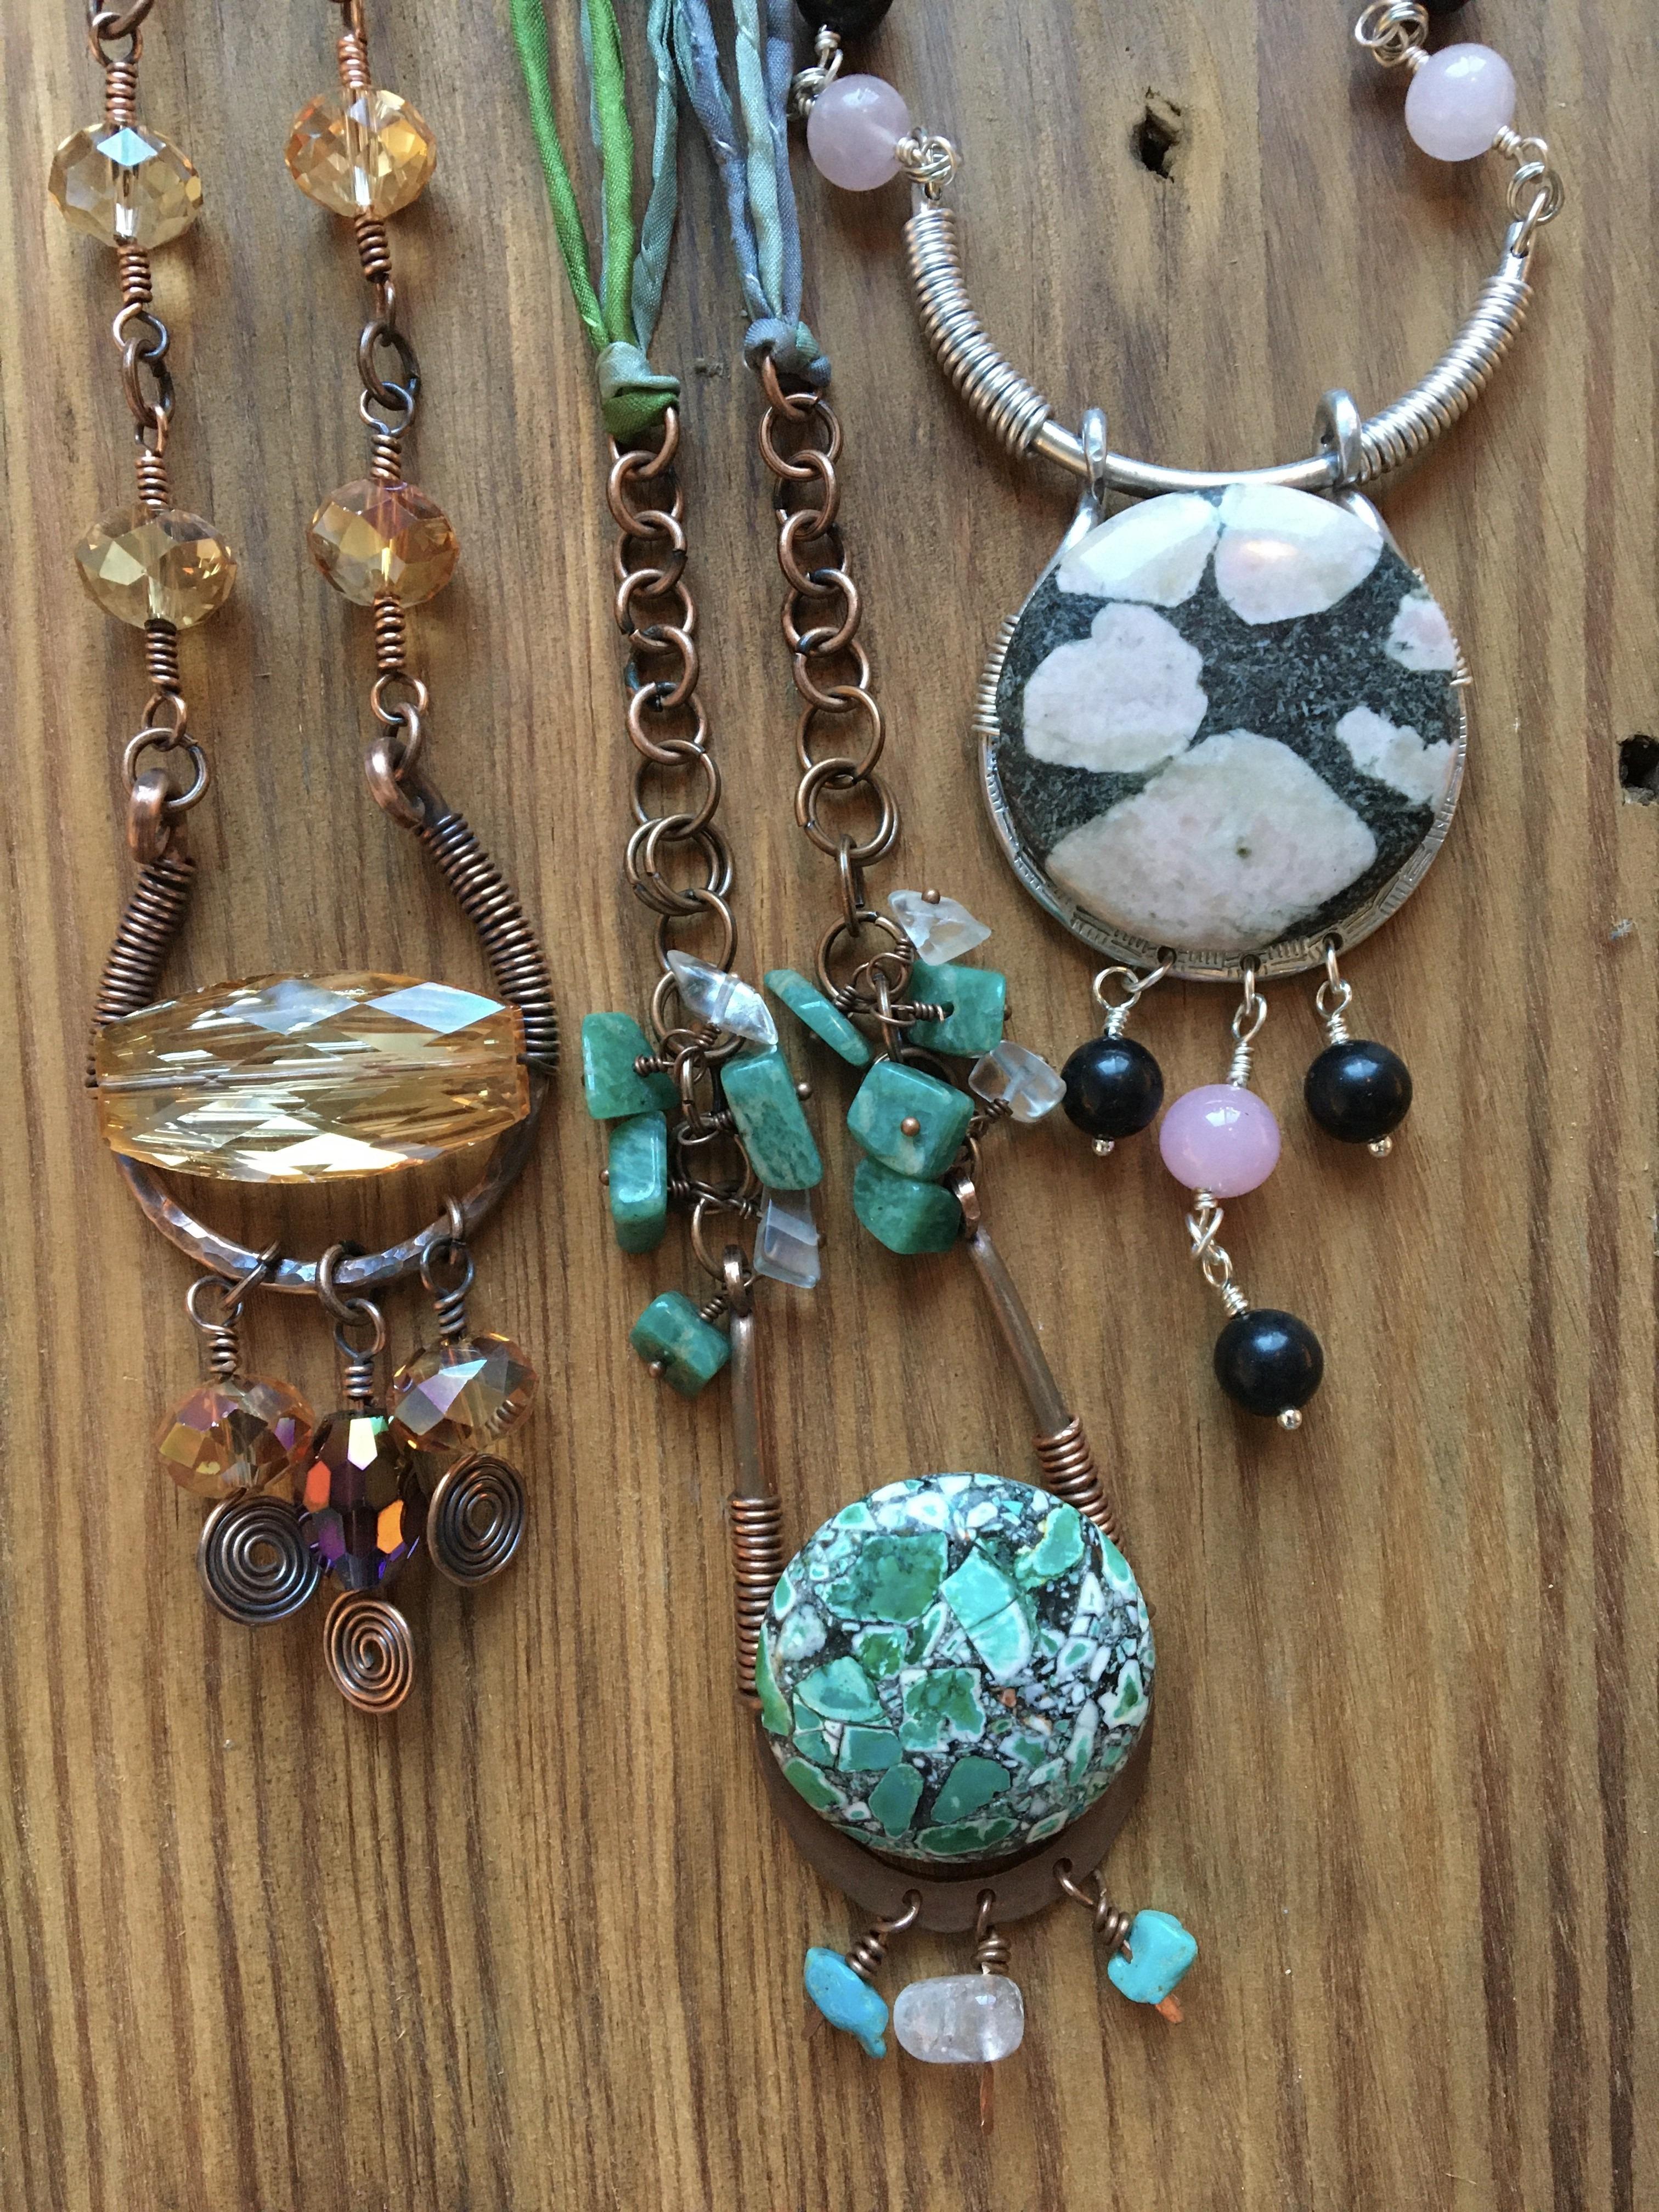 Photo: Courtesy Jewelry Craft & Design Expo